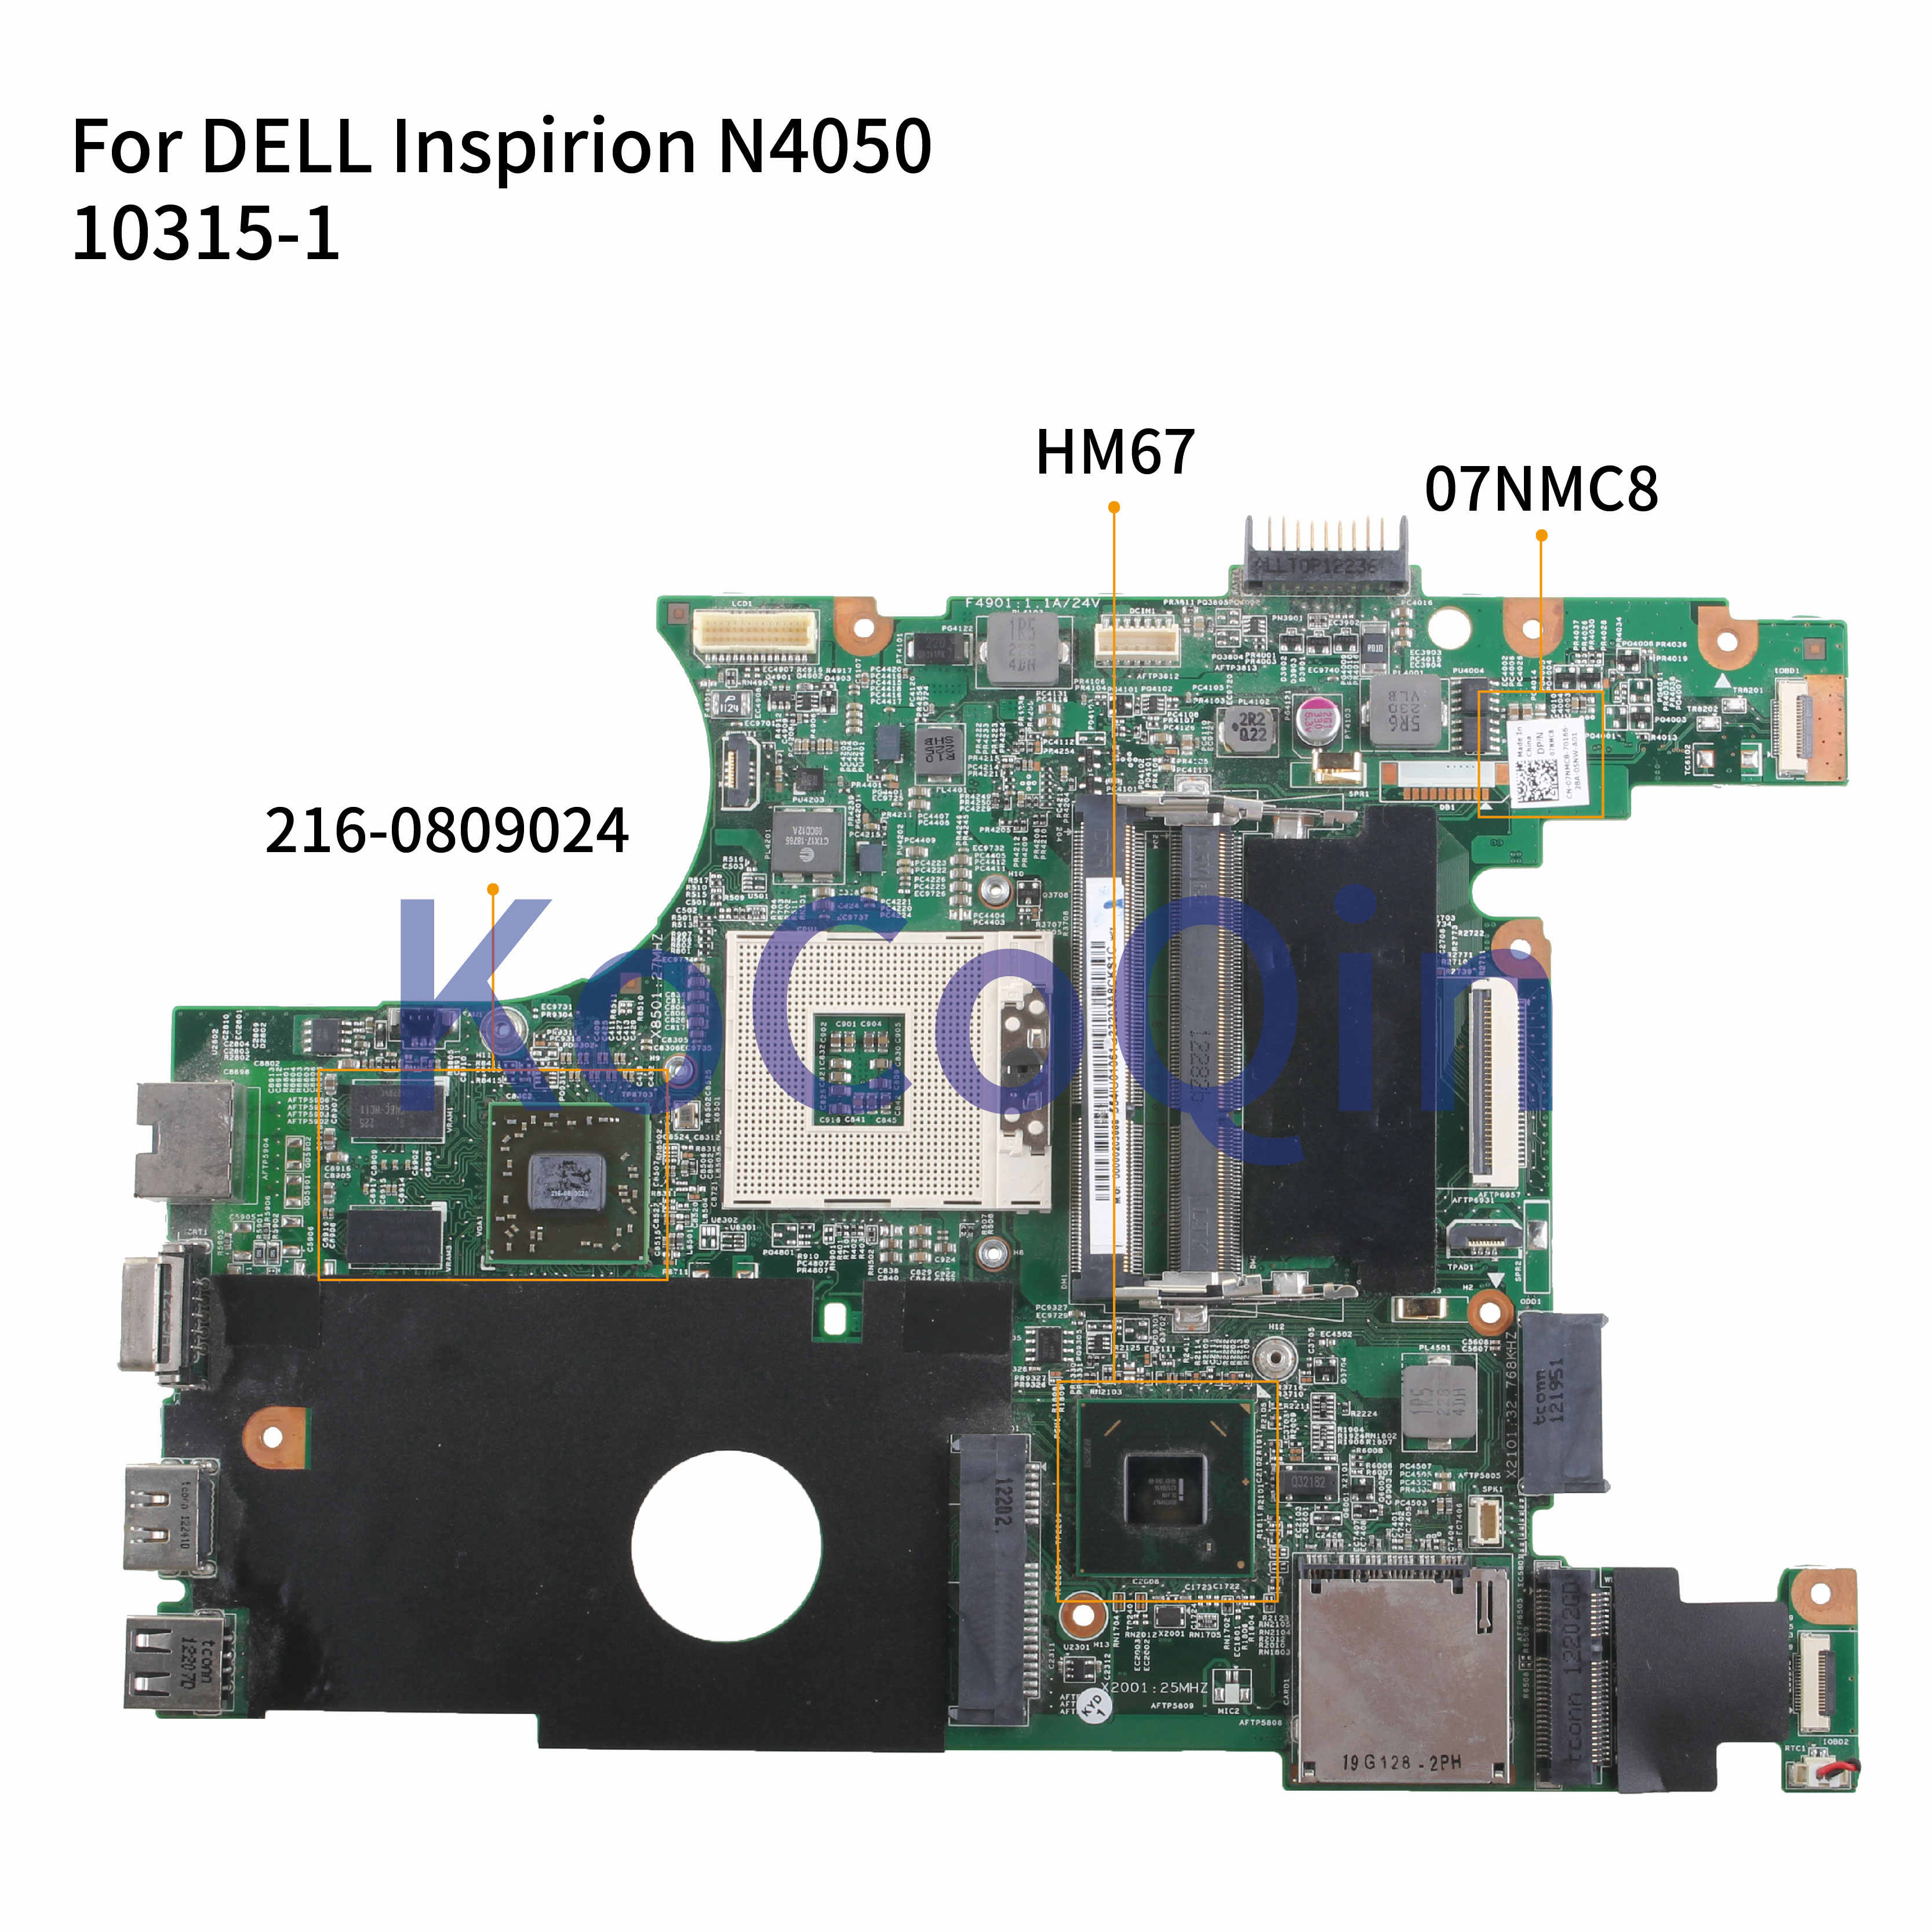 KoCoQin האם מחשב נייד עבור DELL Inspirion 14R N4050 HD6470M Mainboard CN-07NMC8 07NMC8 48.4IU15.01M 10315-1M 216-0809024